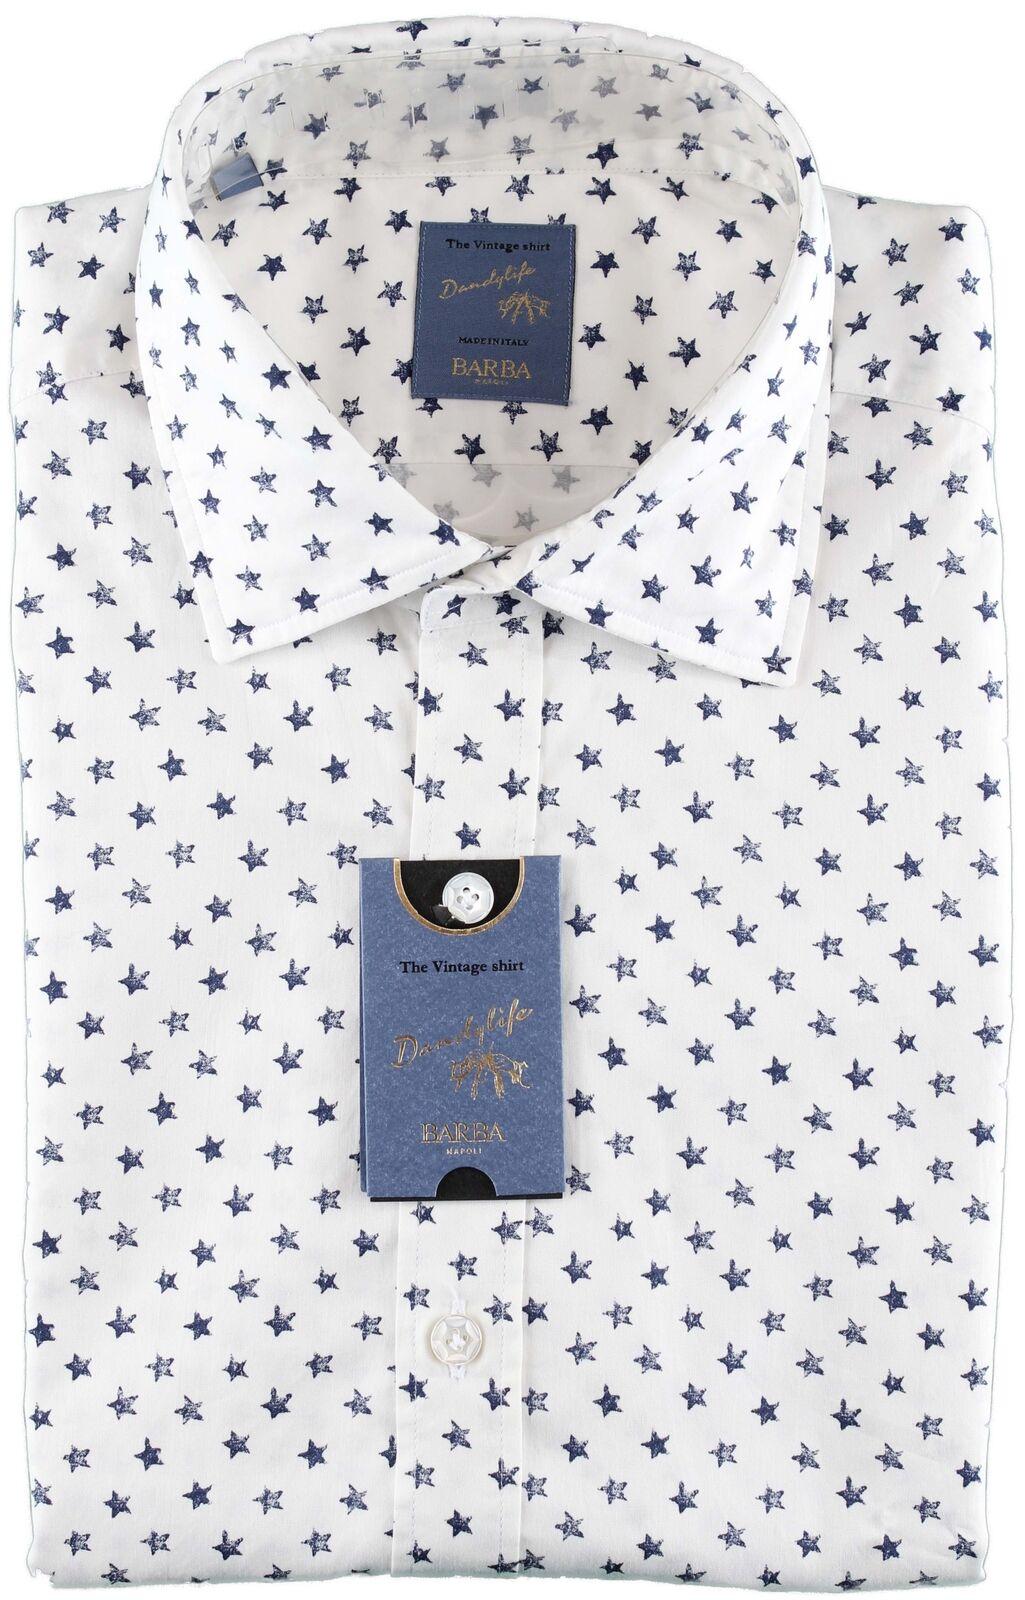 NWT BARBA NAPOLI hemd dandy life stars Weiß Blau handmade 40 15 3 4